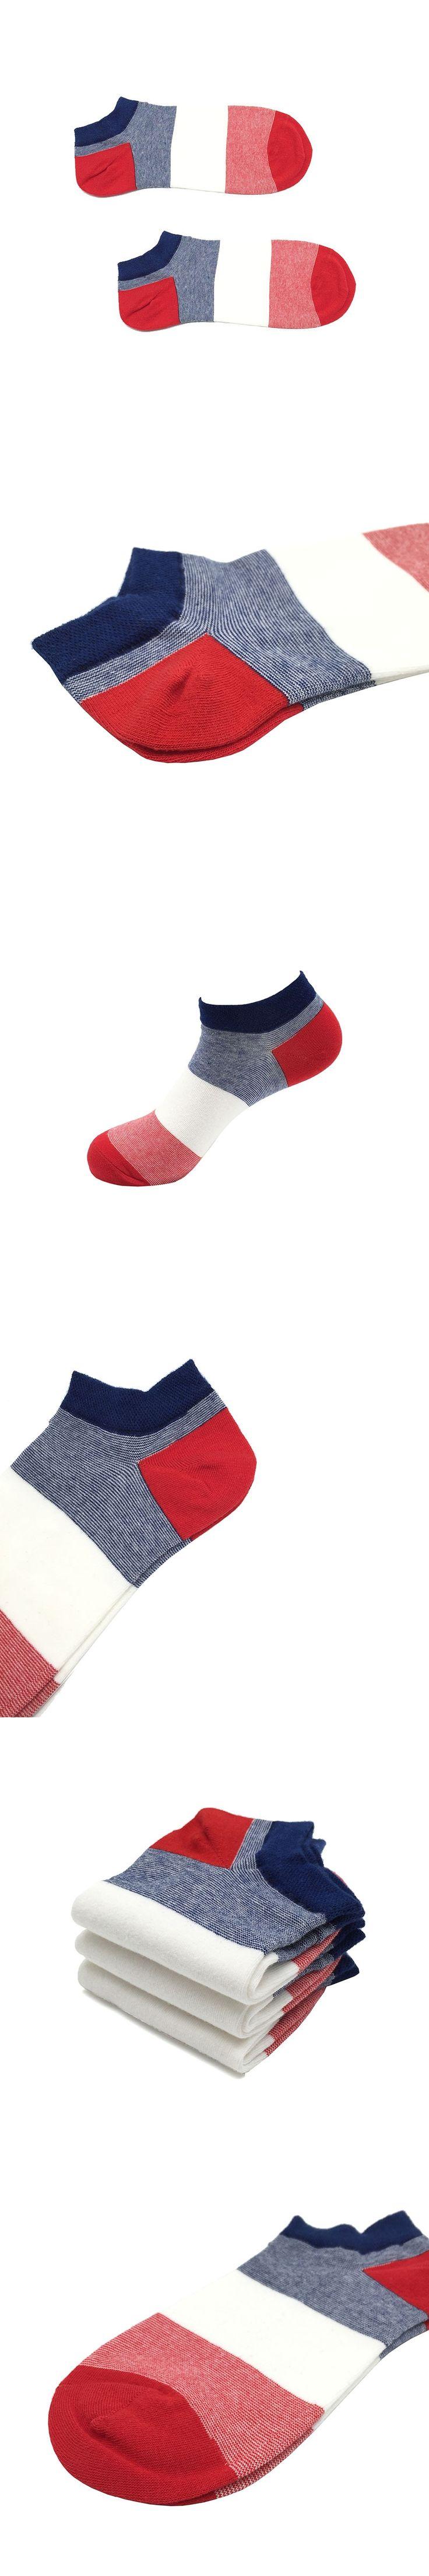 2 Pairs Mens Red Stripe Socks Cotton Ankle Socks Lot Short Socks Striped